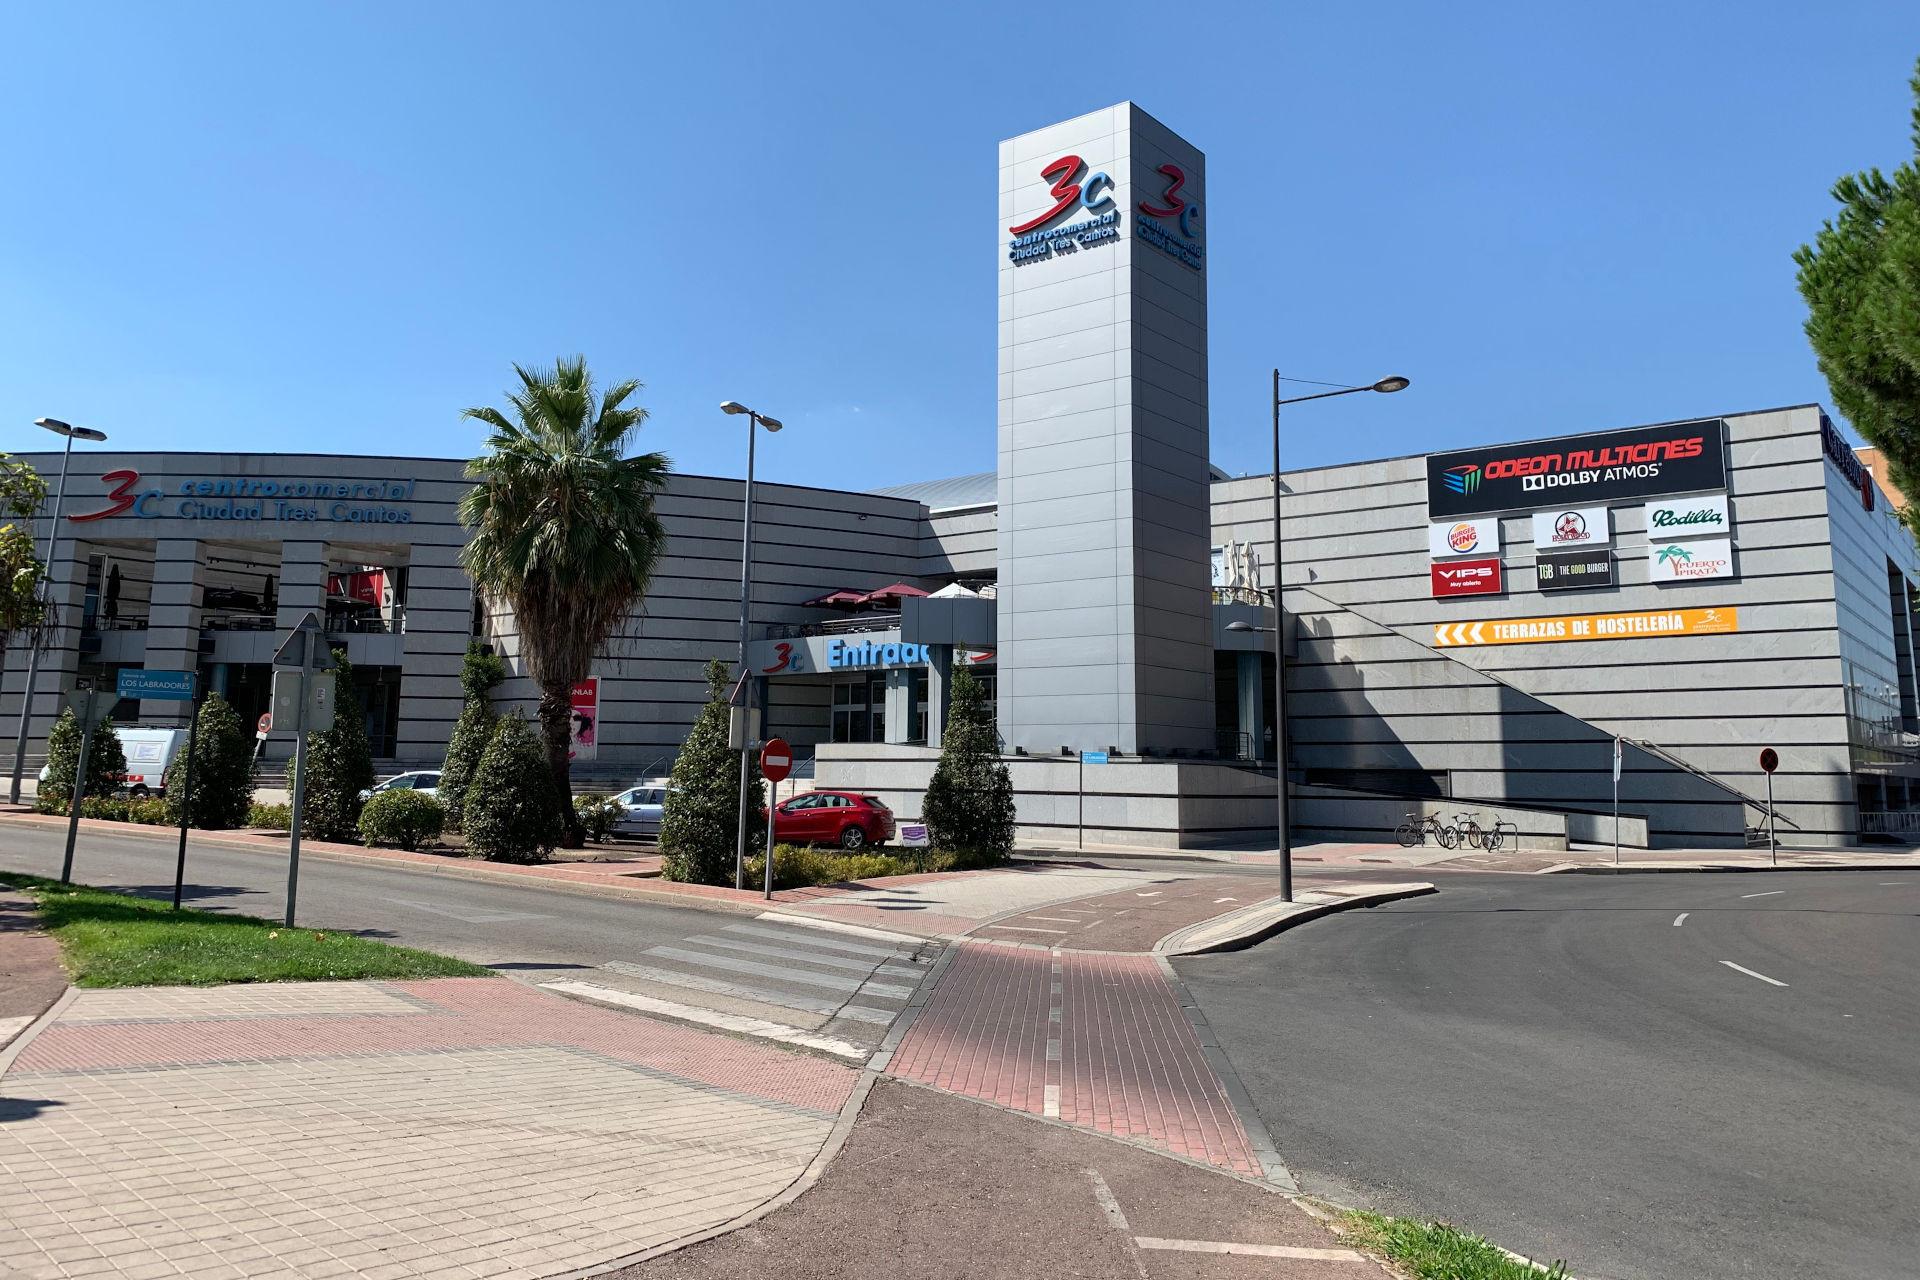 Centro Comercial Ciudad Tres Cantos (Tres Cantos)